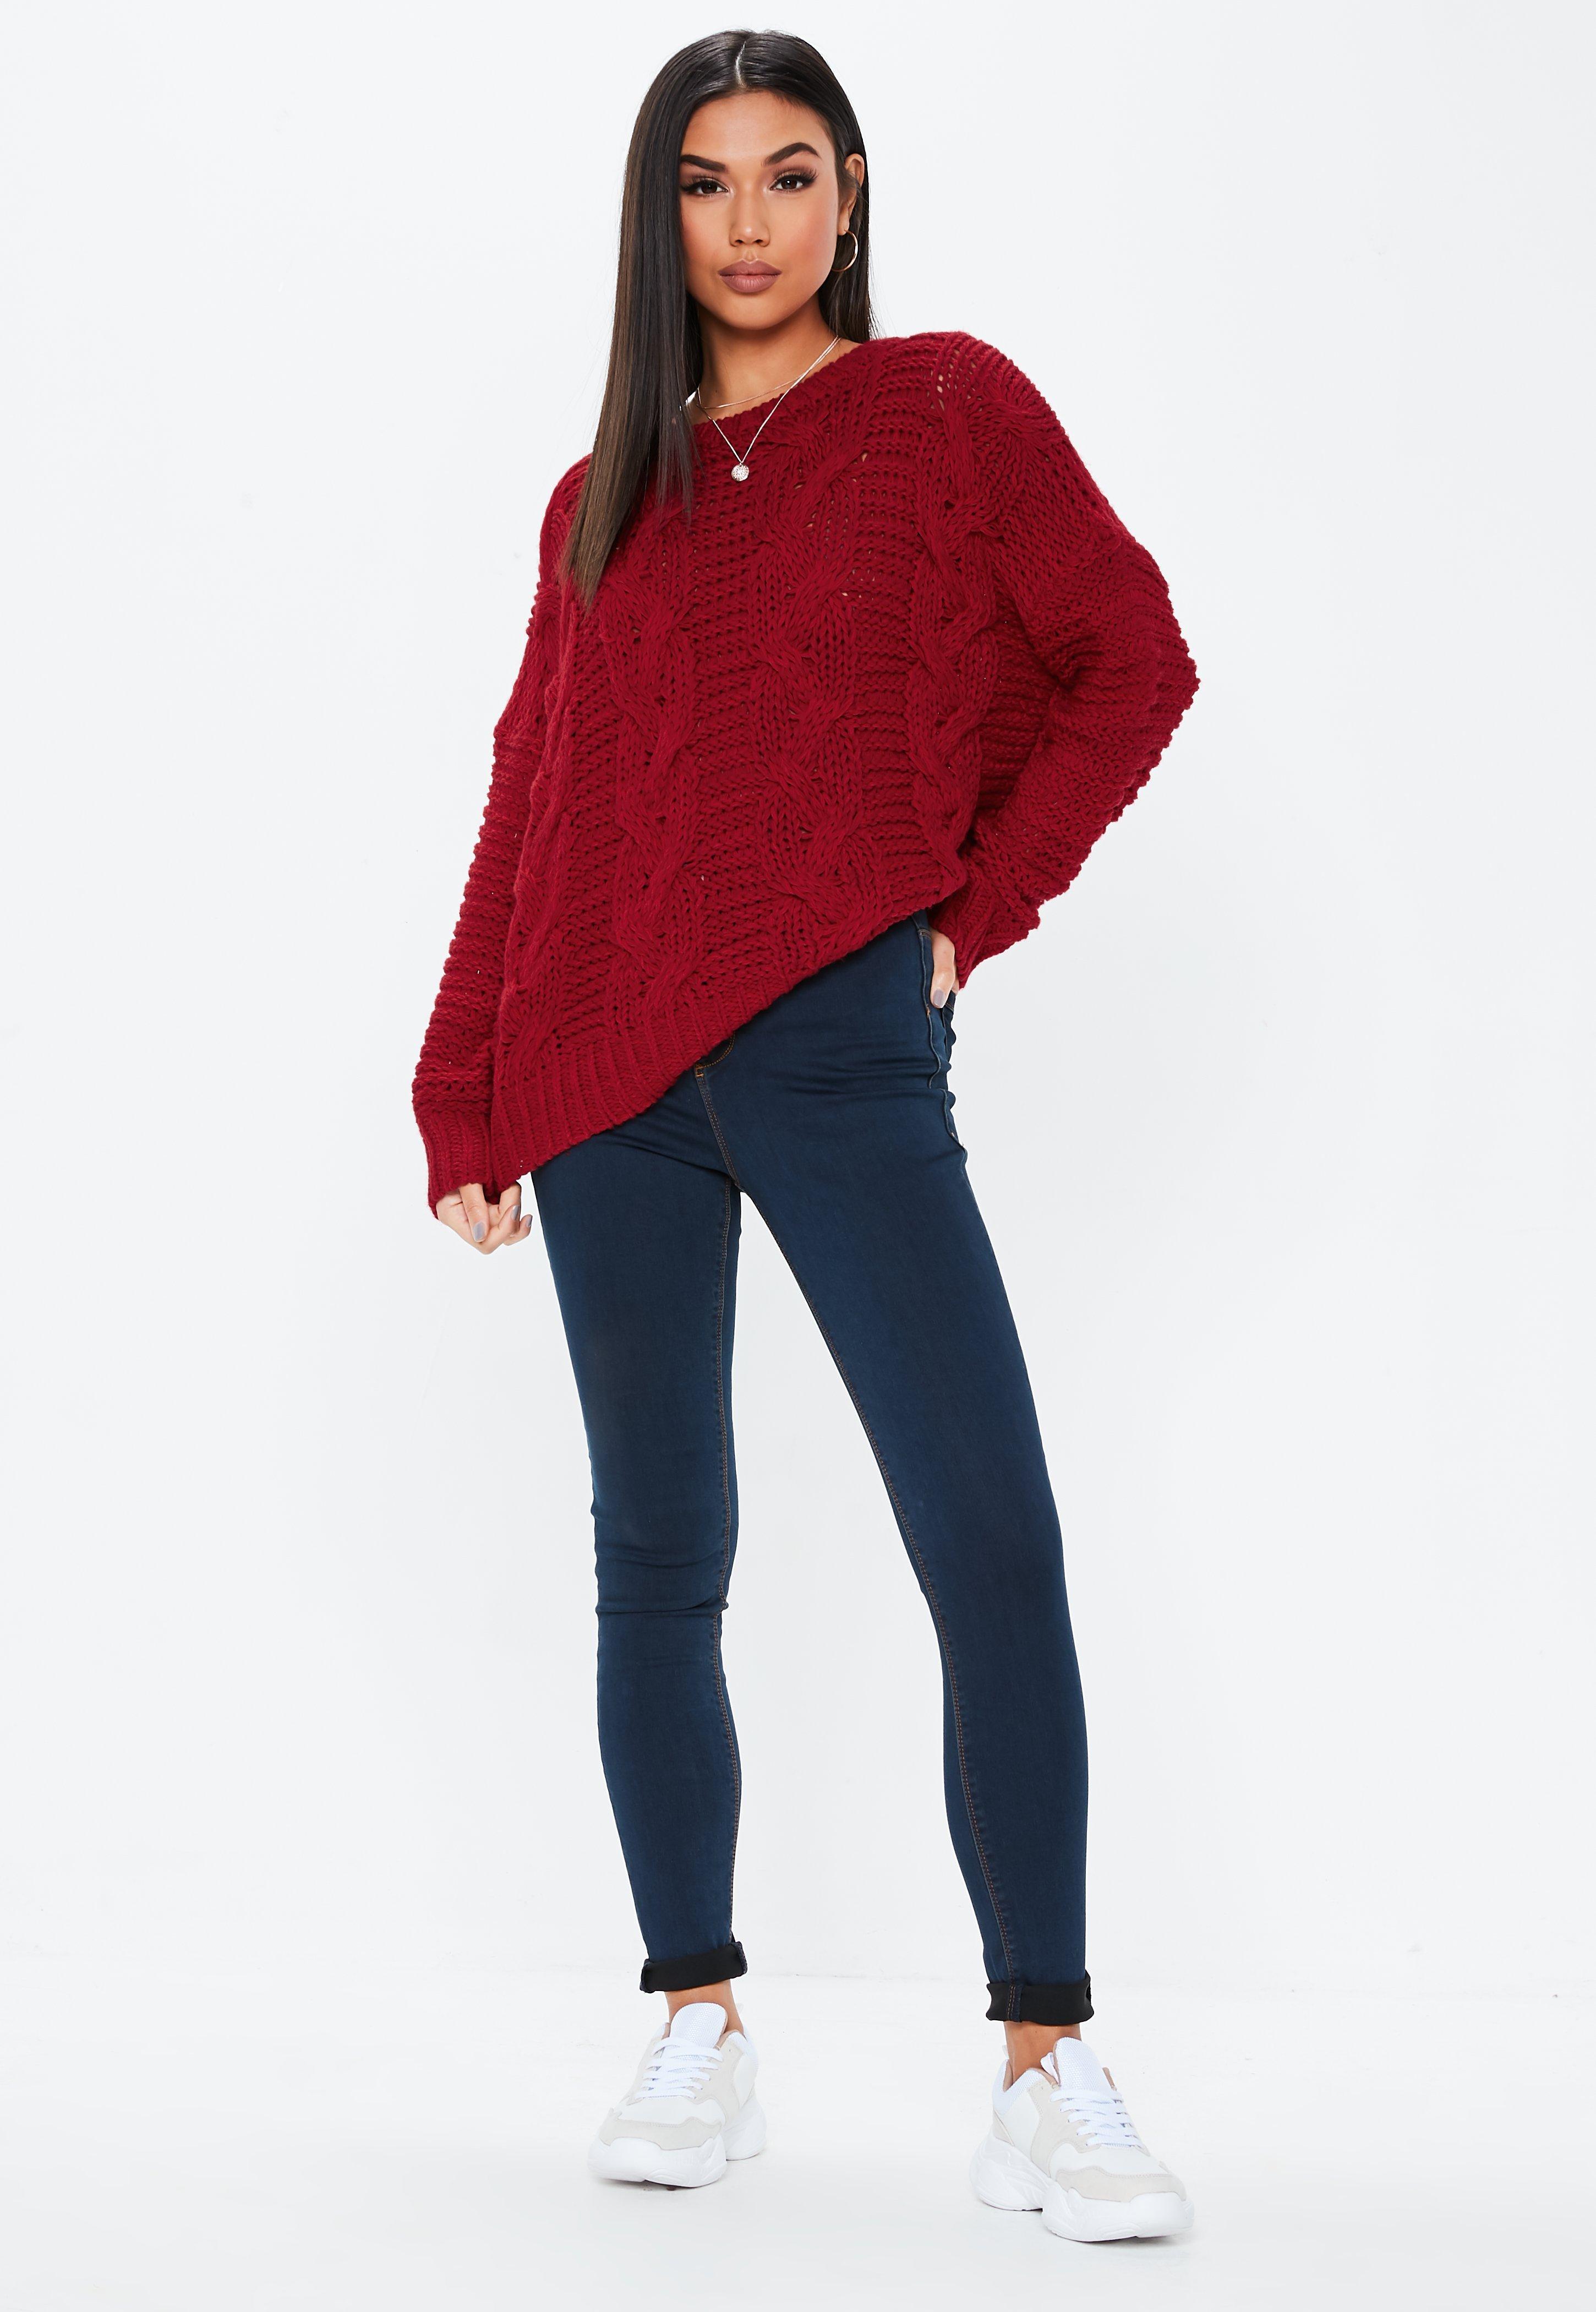 5440a3b1c5 Sale - Cheap Clothes for Women Online - Missguided Australia